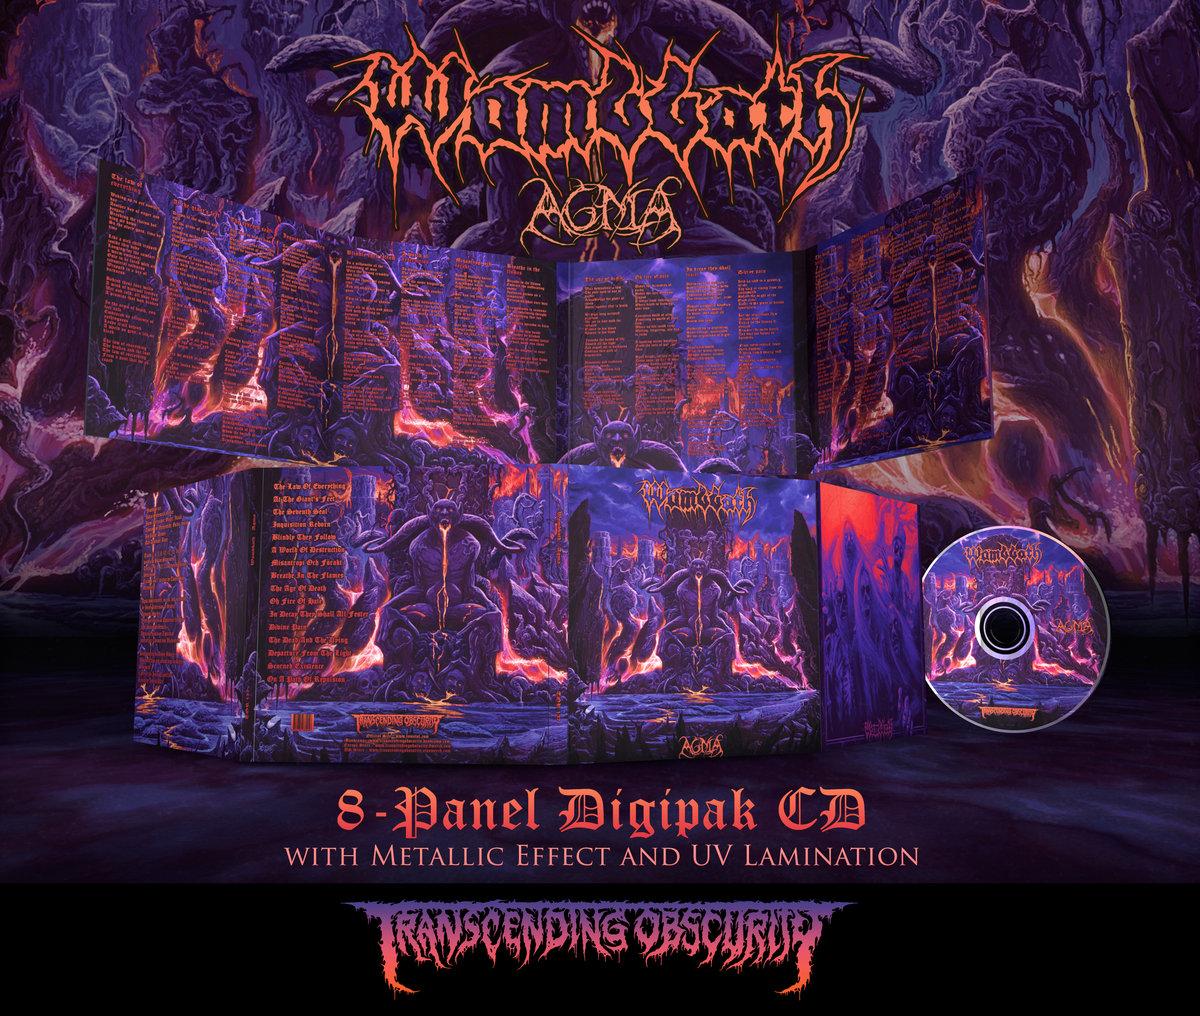 WOMBBATH - Agma 8-Panel Digipak CD with Metallic Effect and Spot UV Lamination